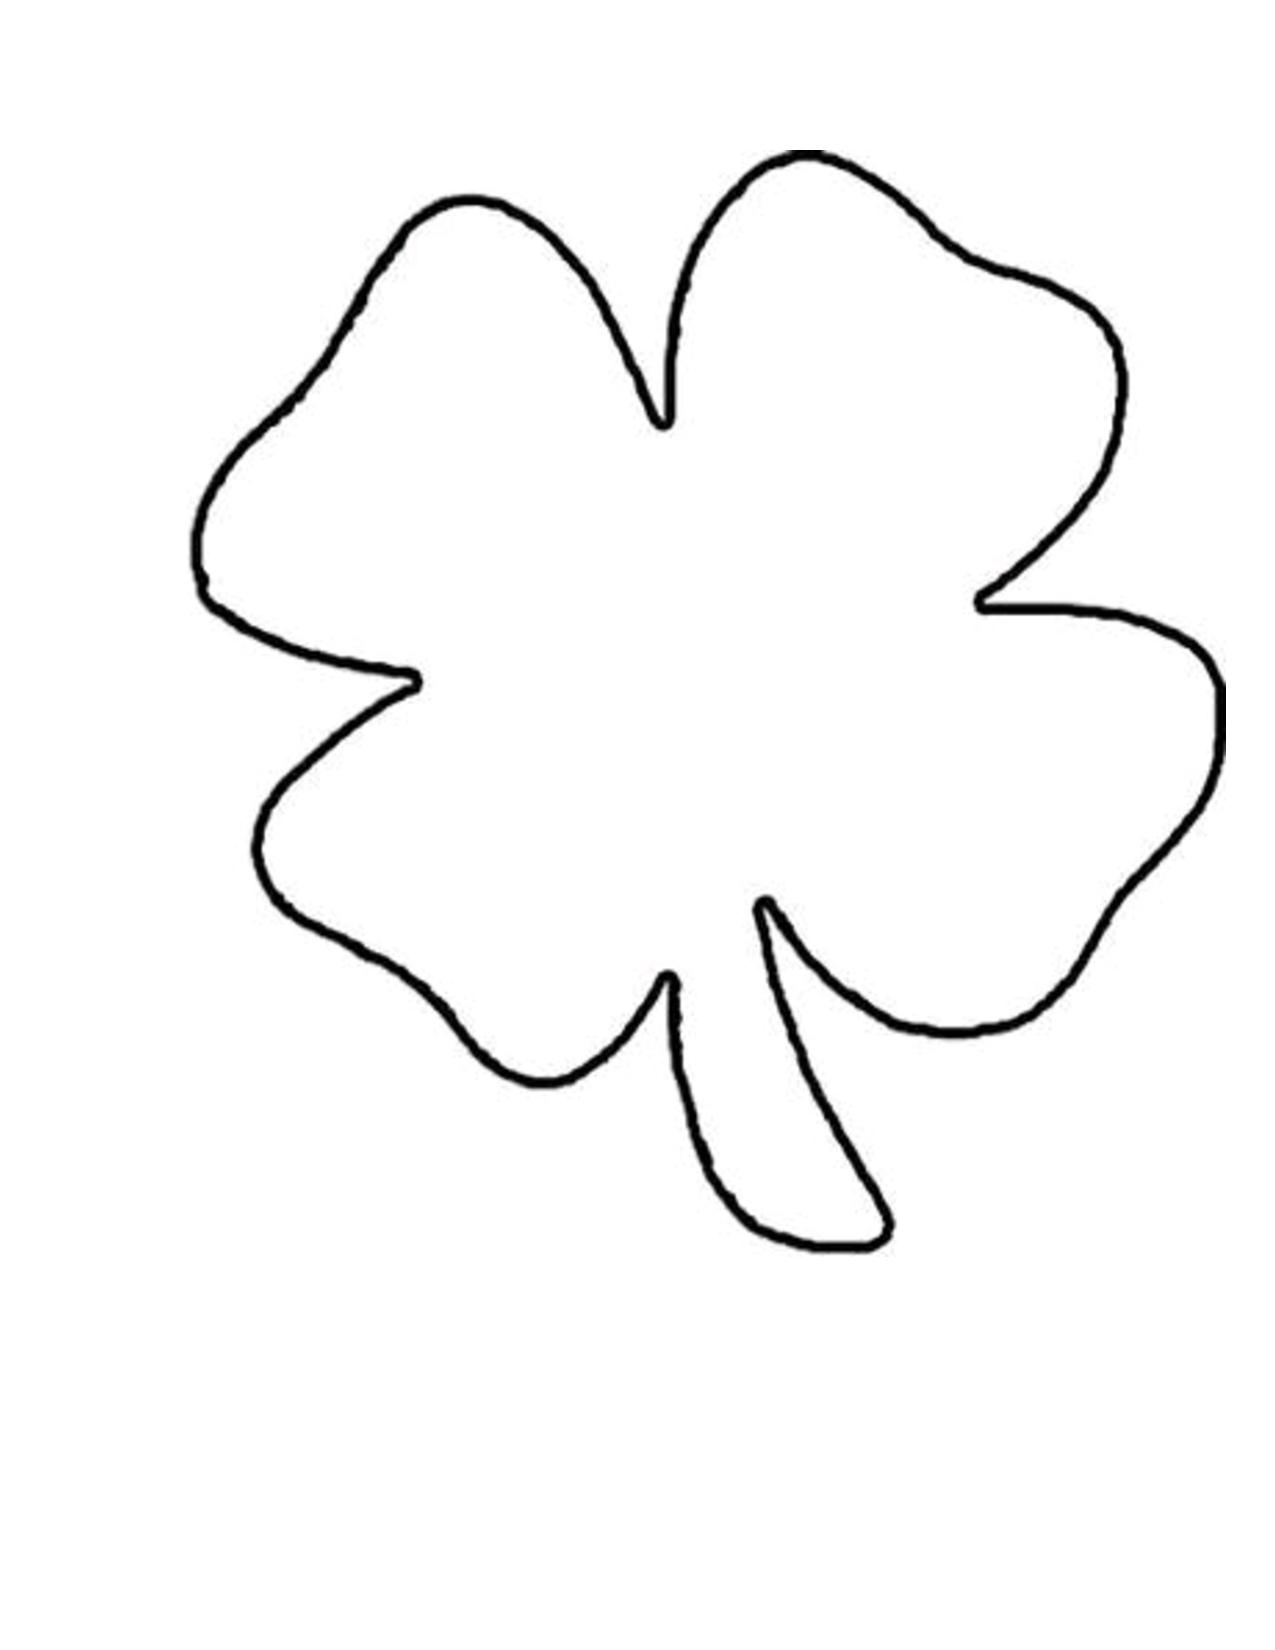 4+Clover+Leaf+Template+Shamrock+Pattern | St. Patricks | Shamrock - Free Printable Shamrock Cutouts